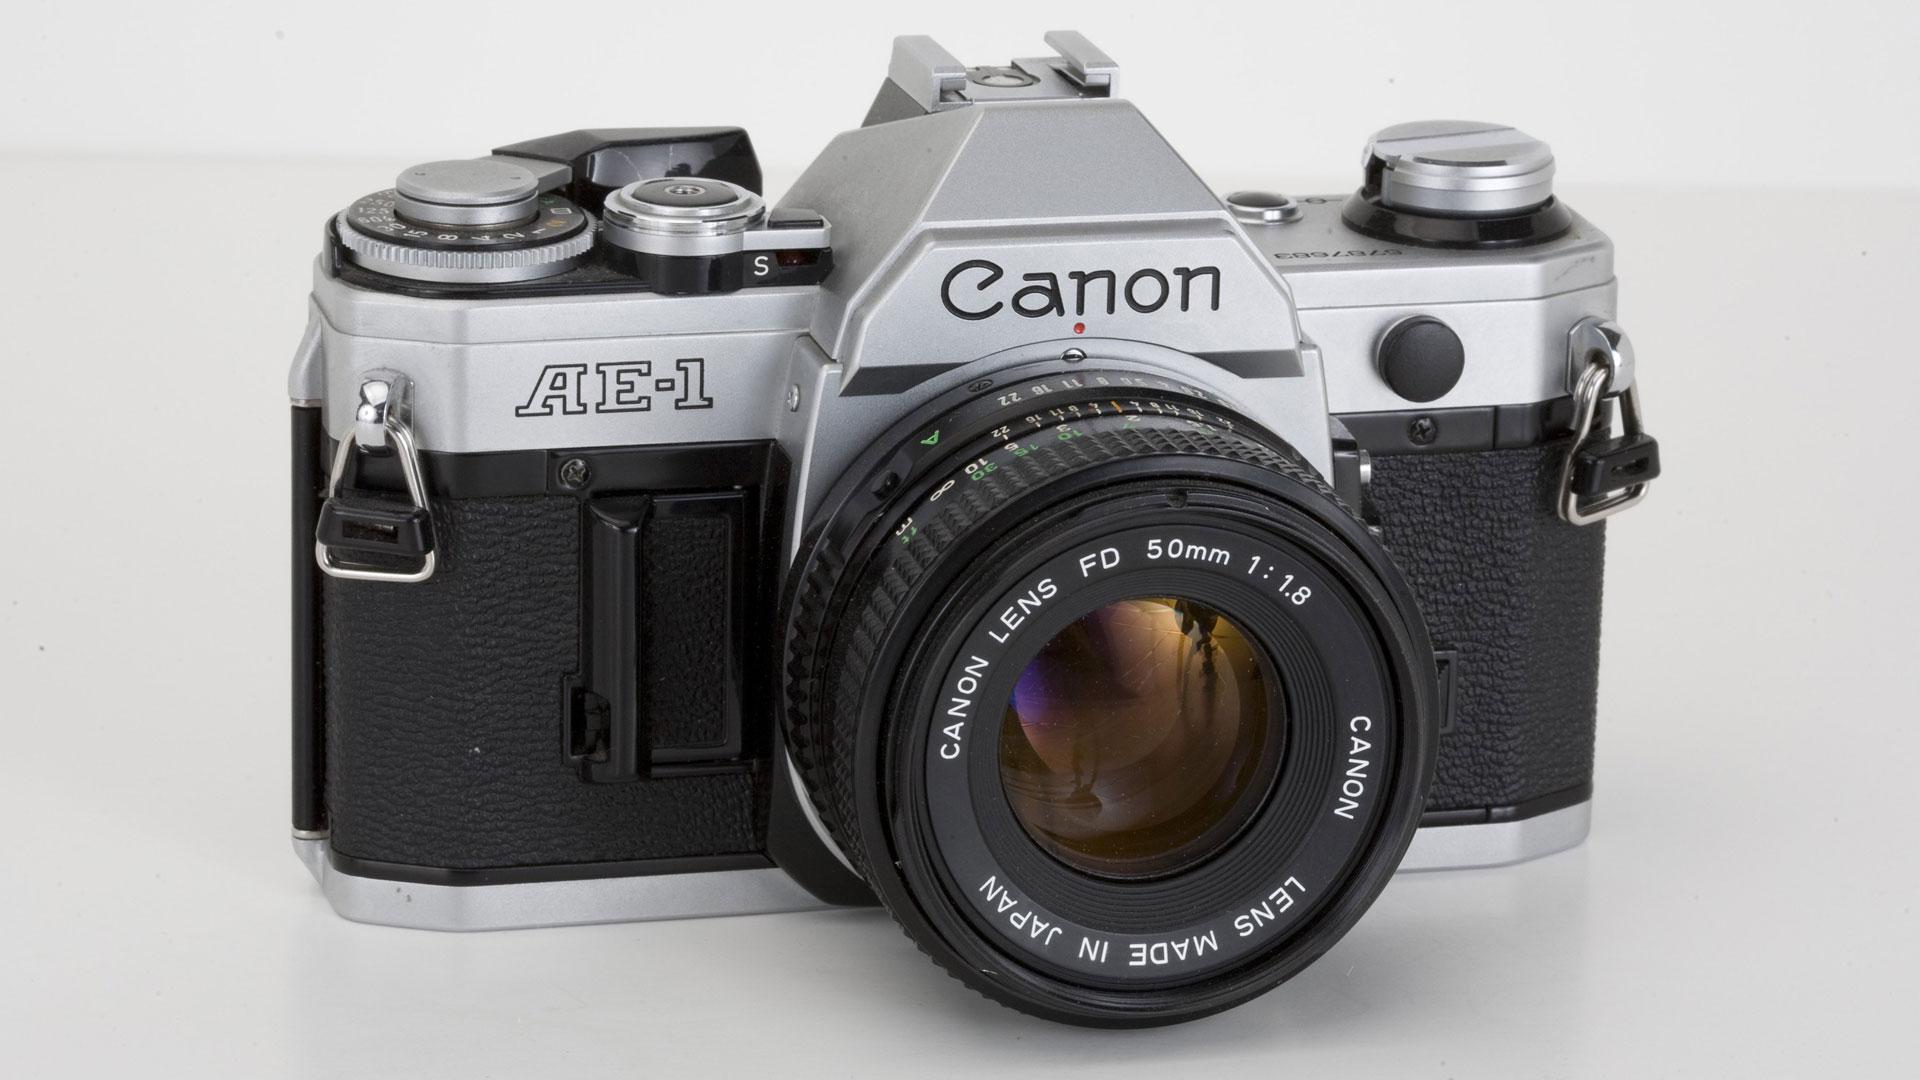 The best film cameras in 2019: cameras that recapture the magic of film | Digital Camera World